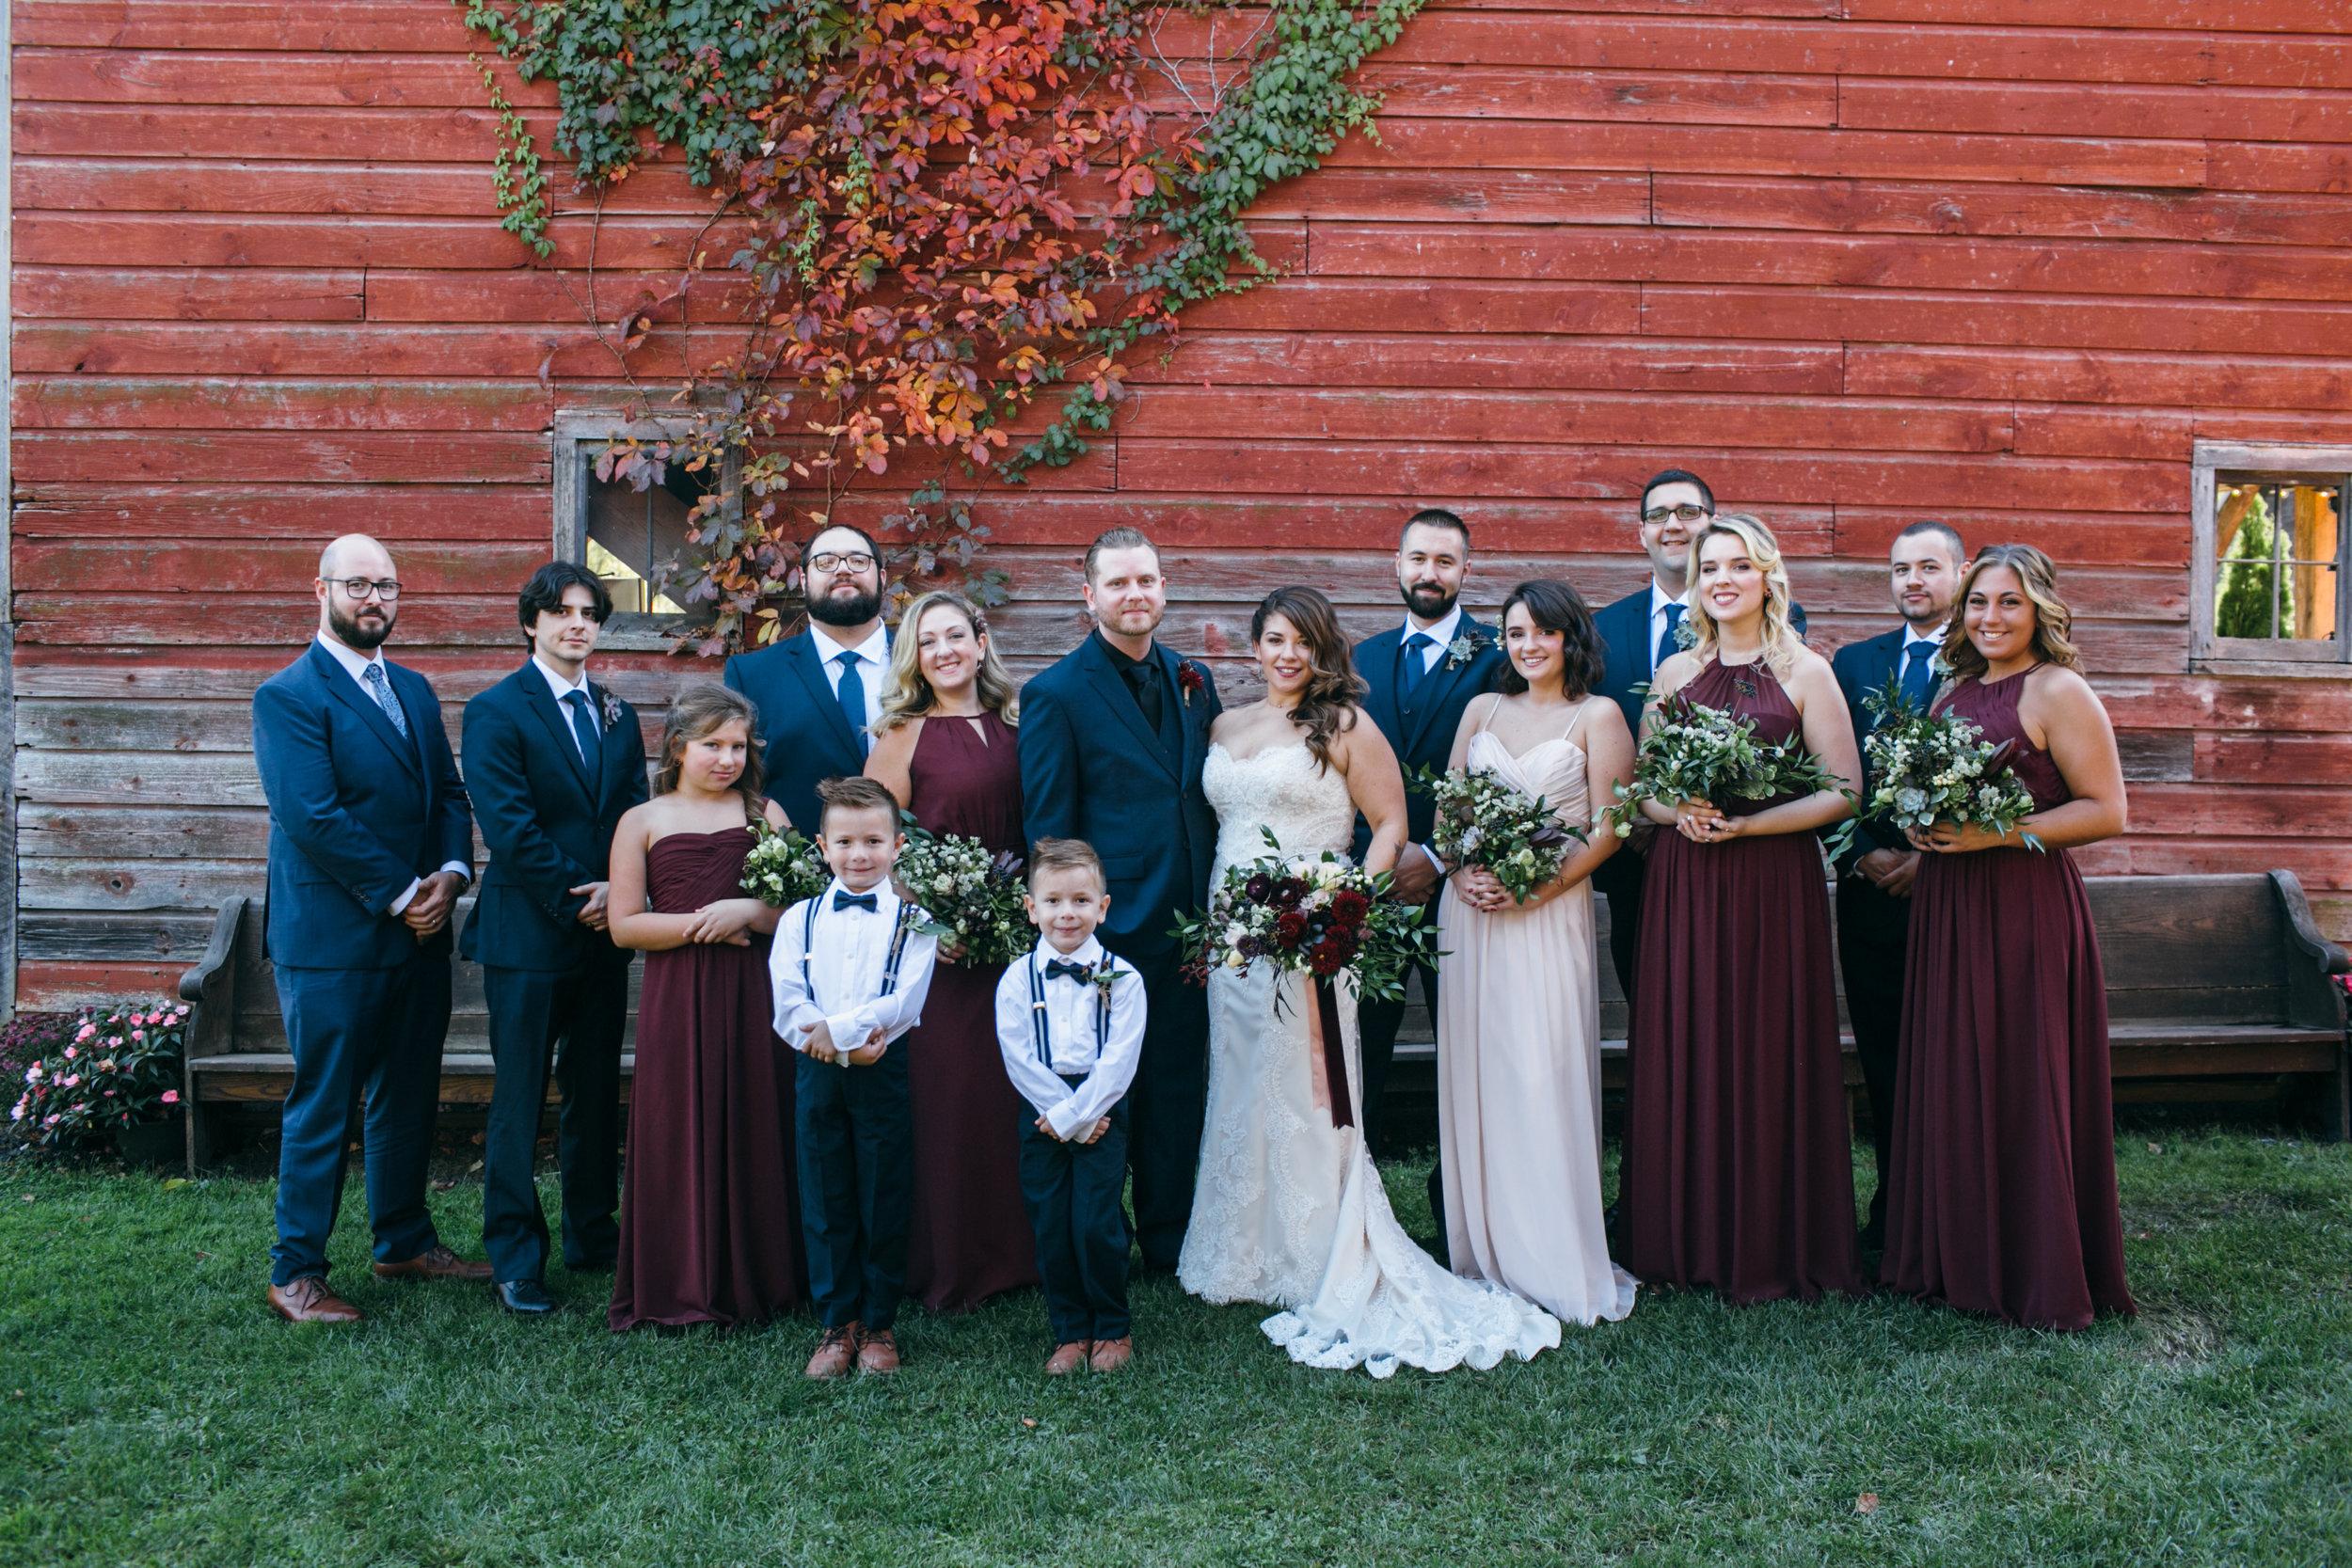 253_alex_audrey_wedding.jpg